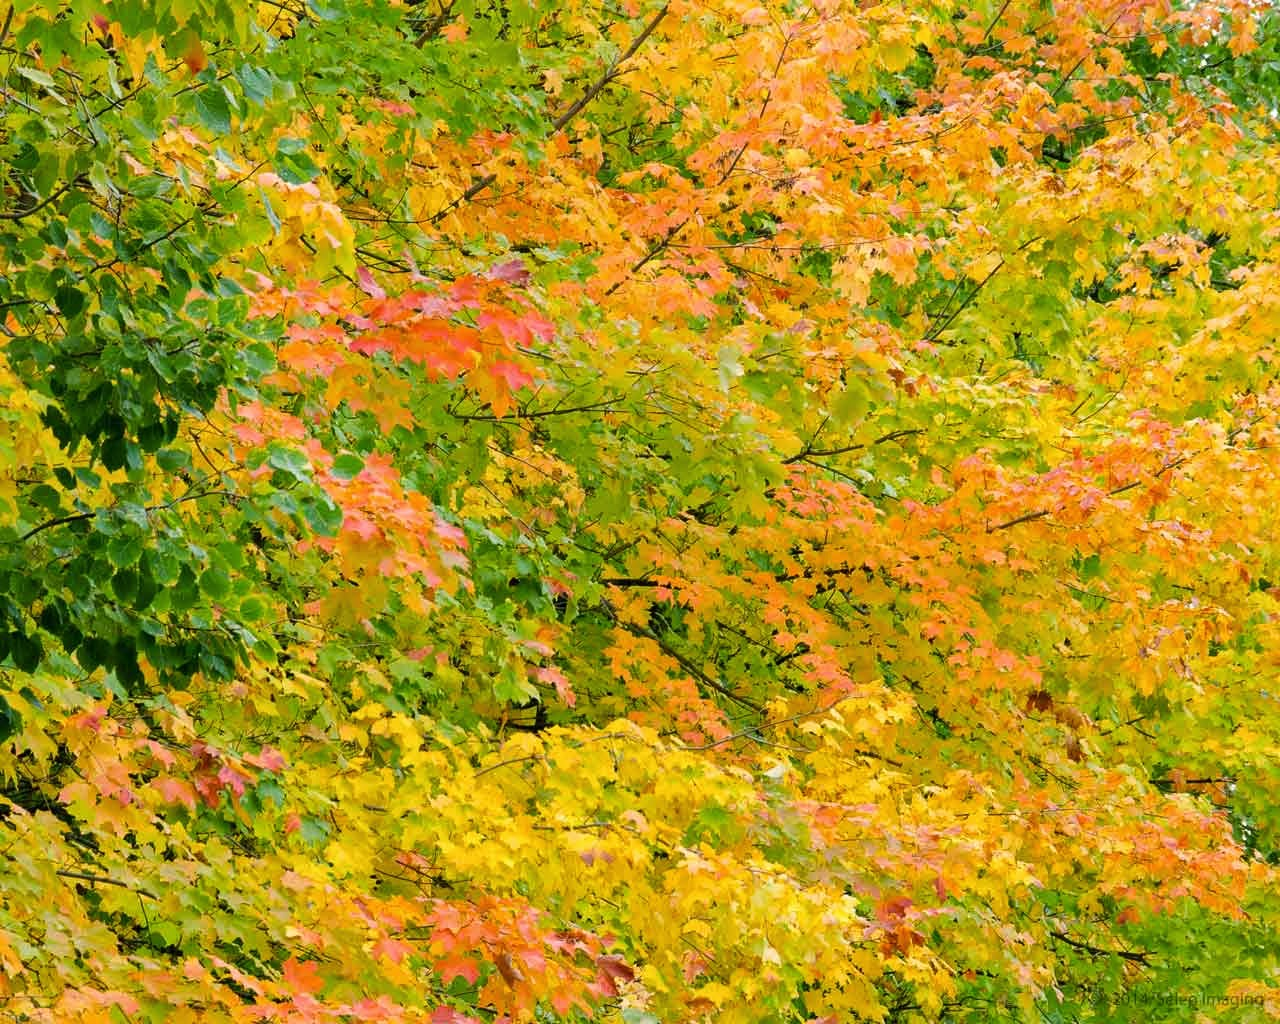 Fall foliage free desktop background by Jeanne Selep